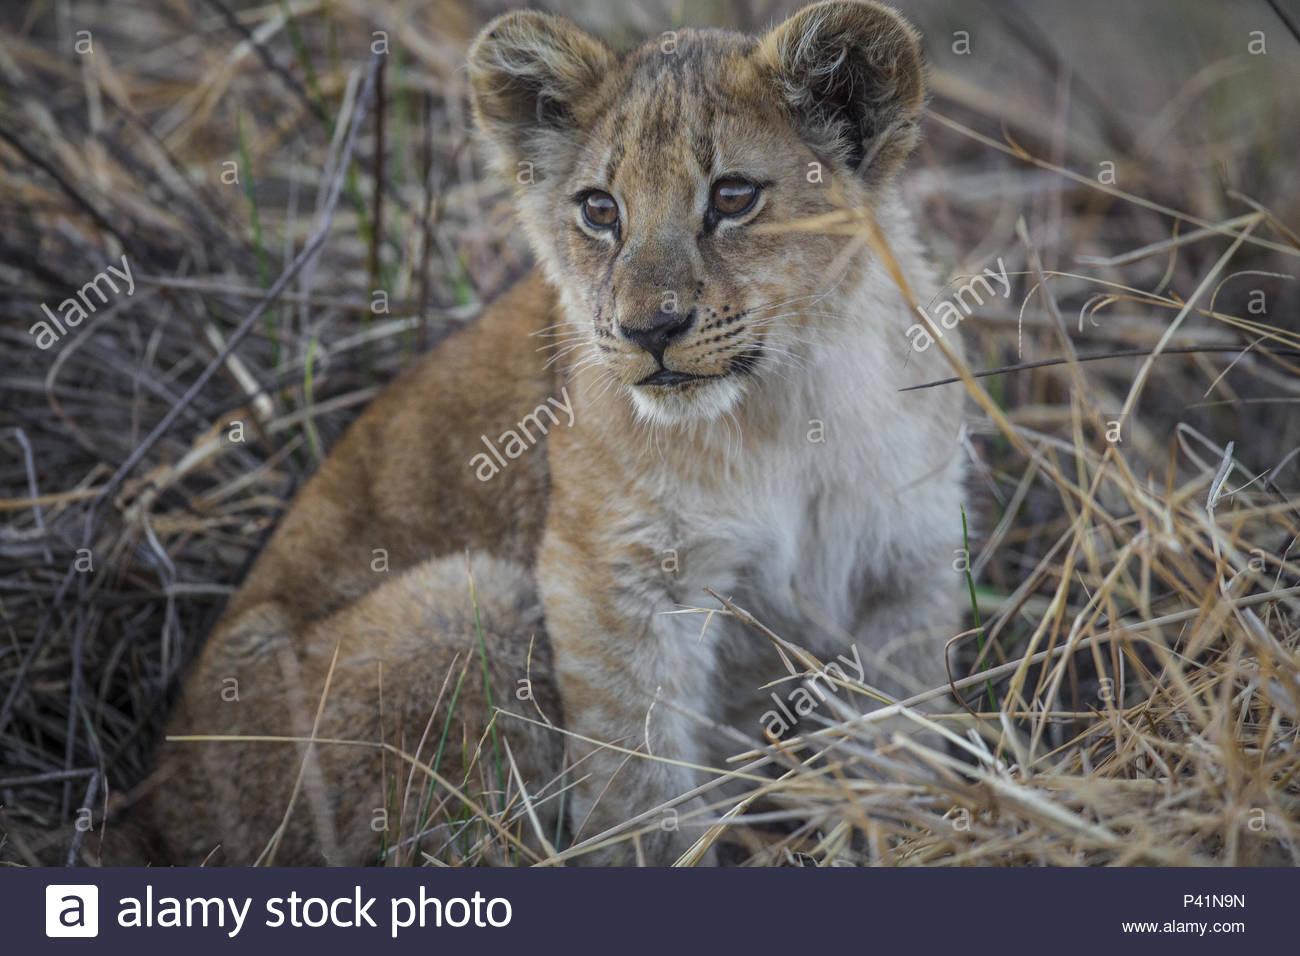 A lion cub on Chief's Island in Botswana's Okavango Delta. - Stock Image